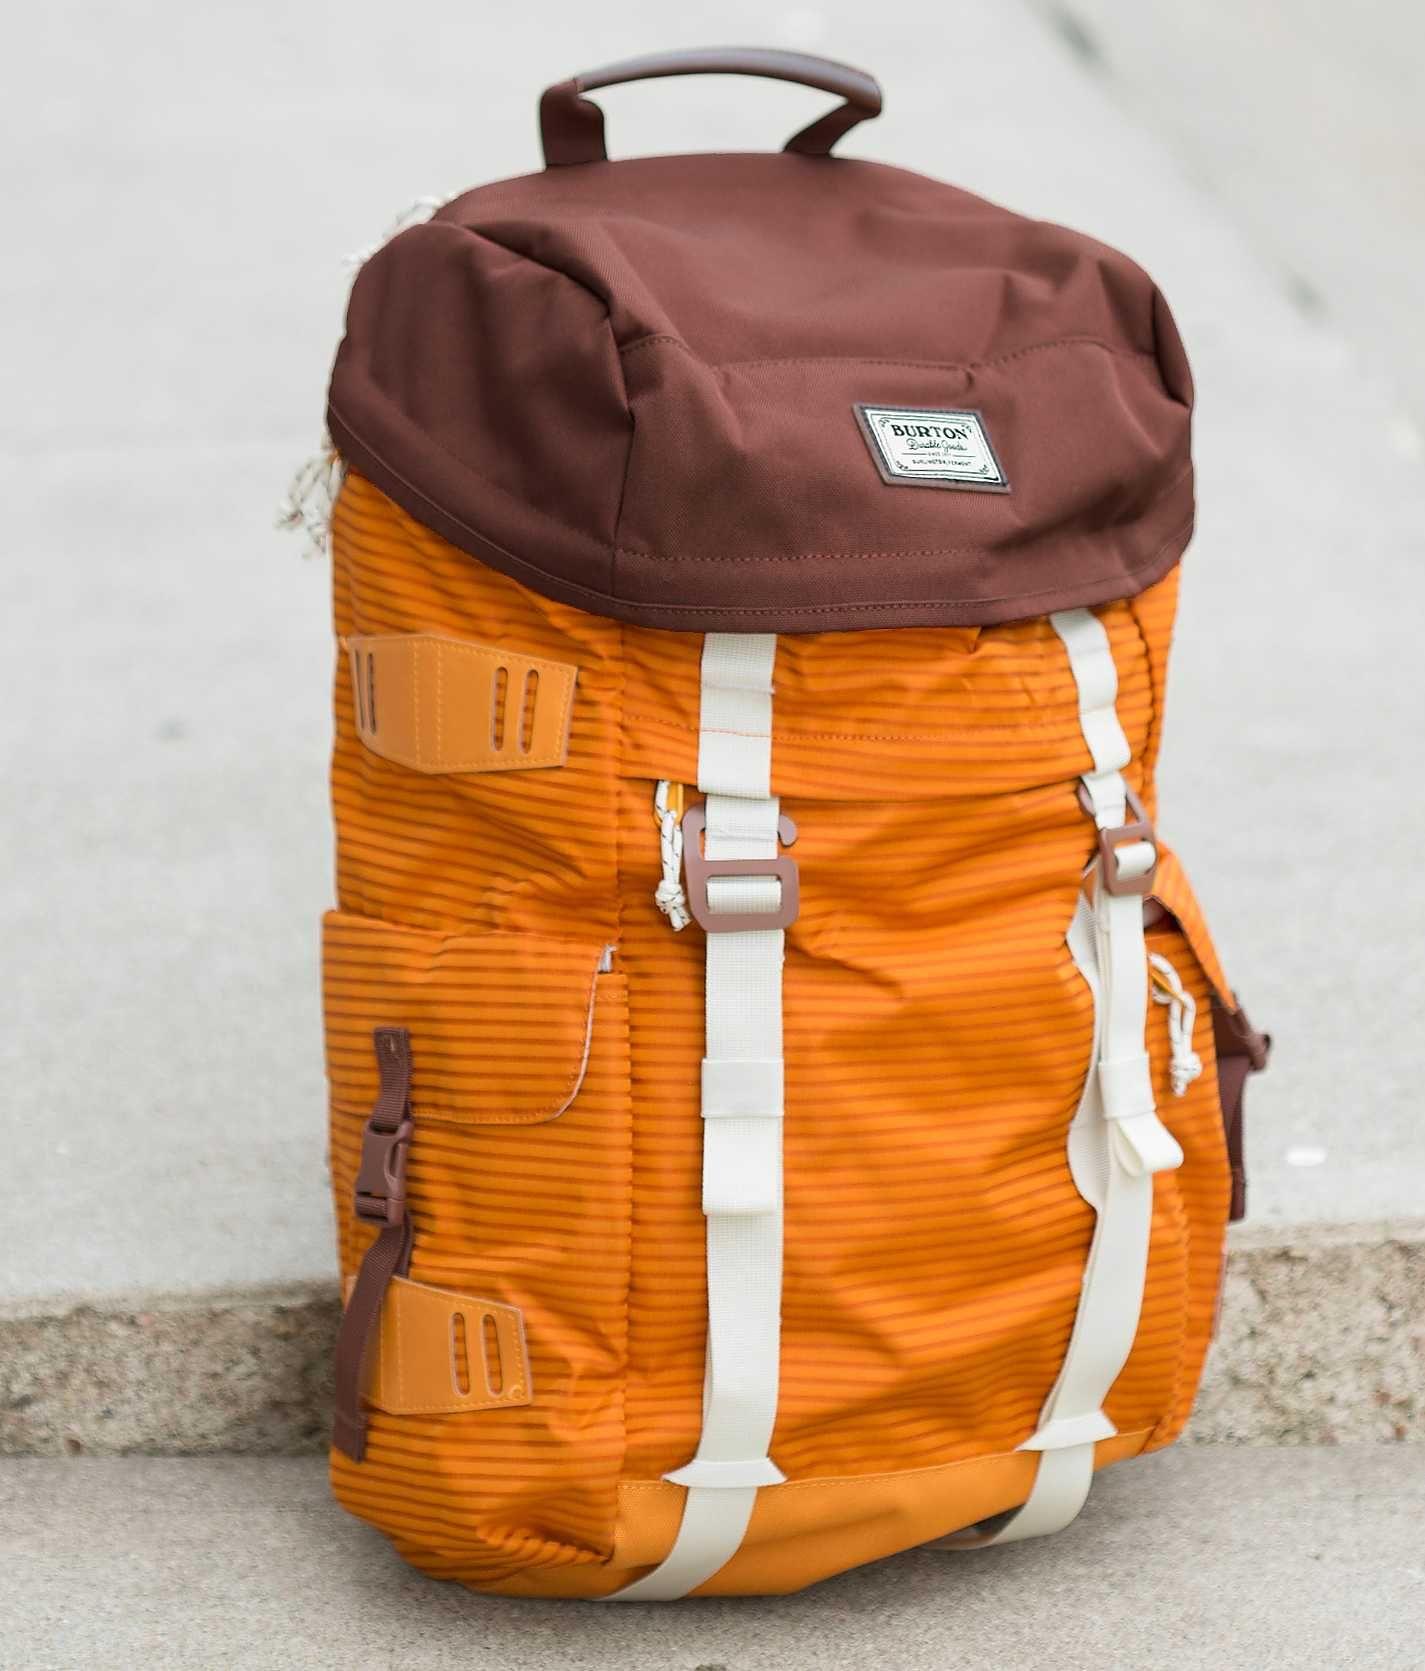 burton backpack orange - Cerca amb Google   Outstanding Fashion ...